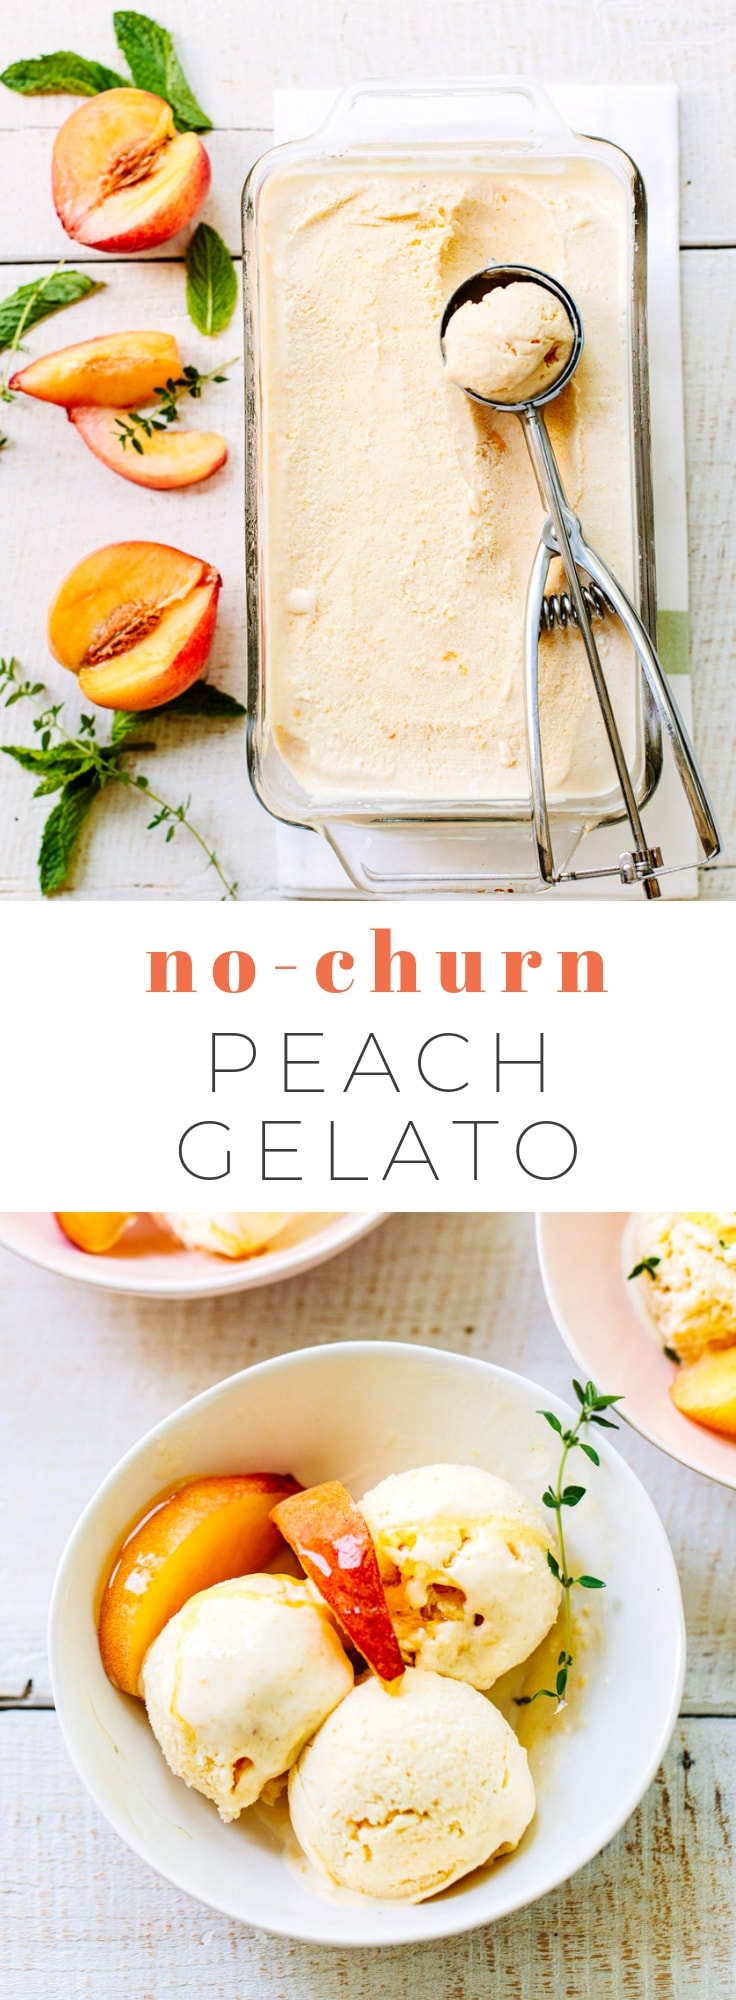 Easy Homemade No-Churn Peach Ice Cream